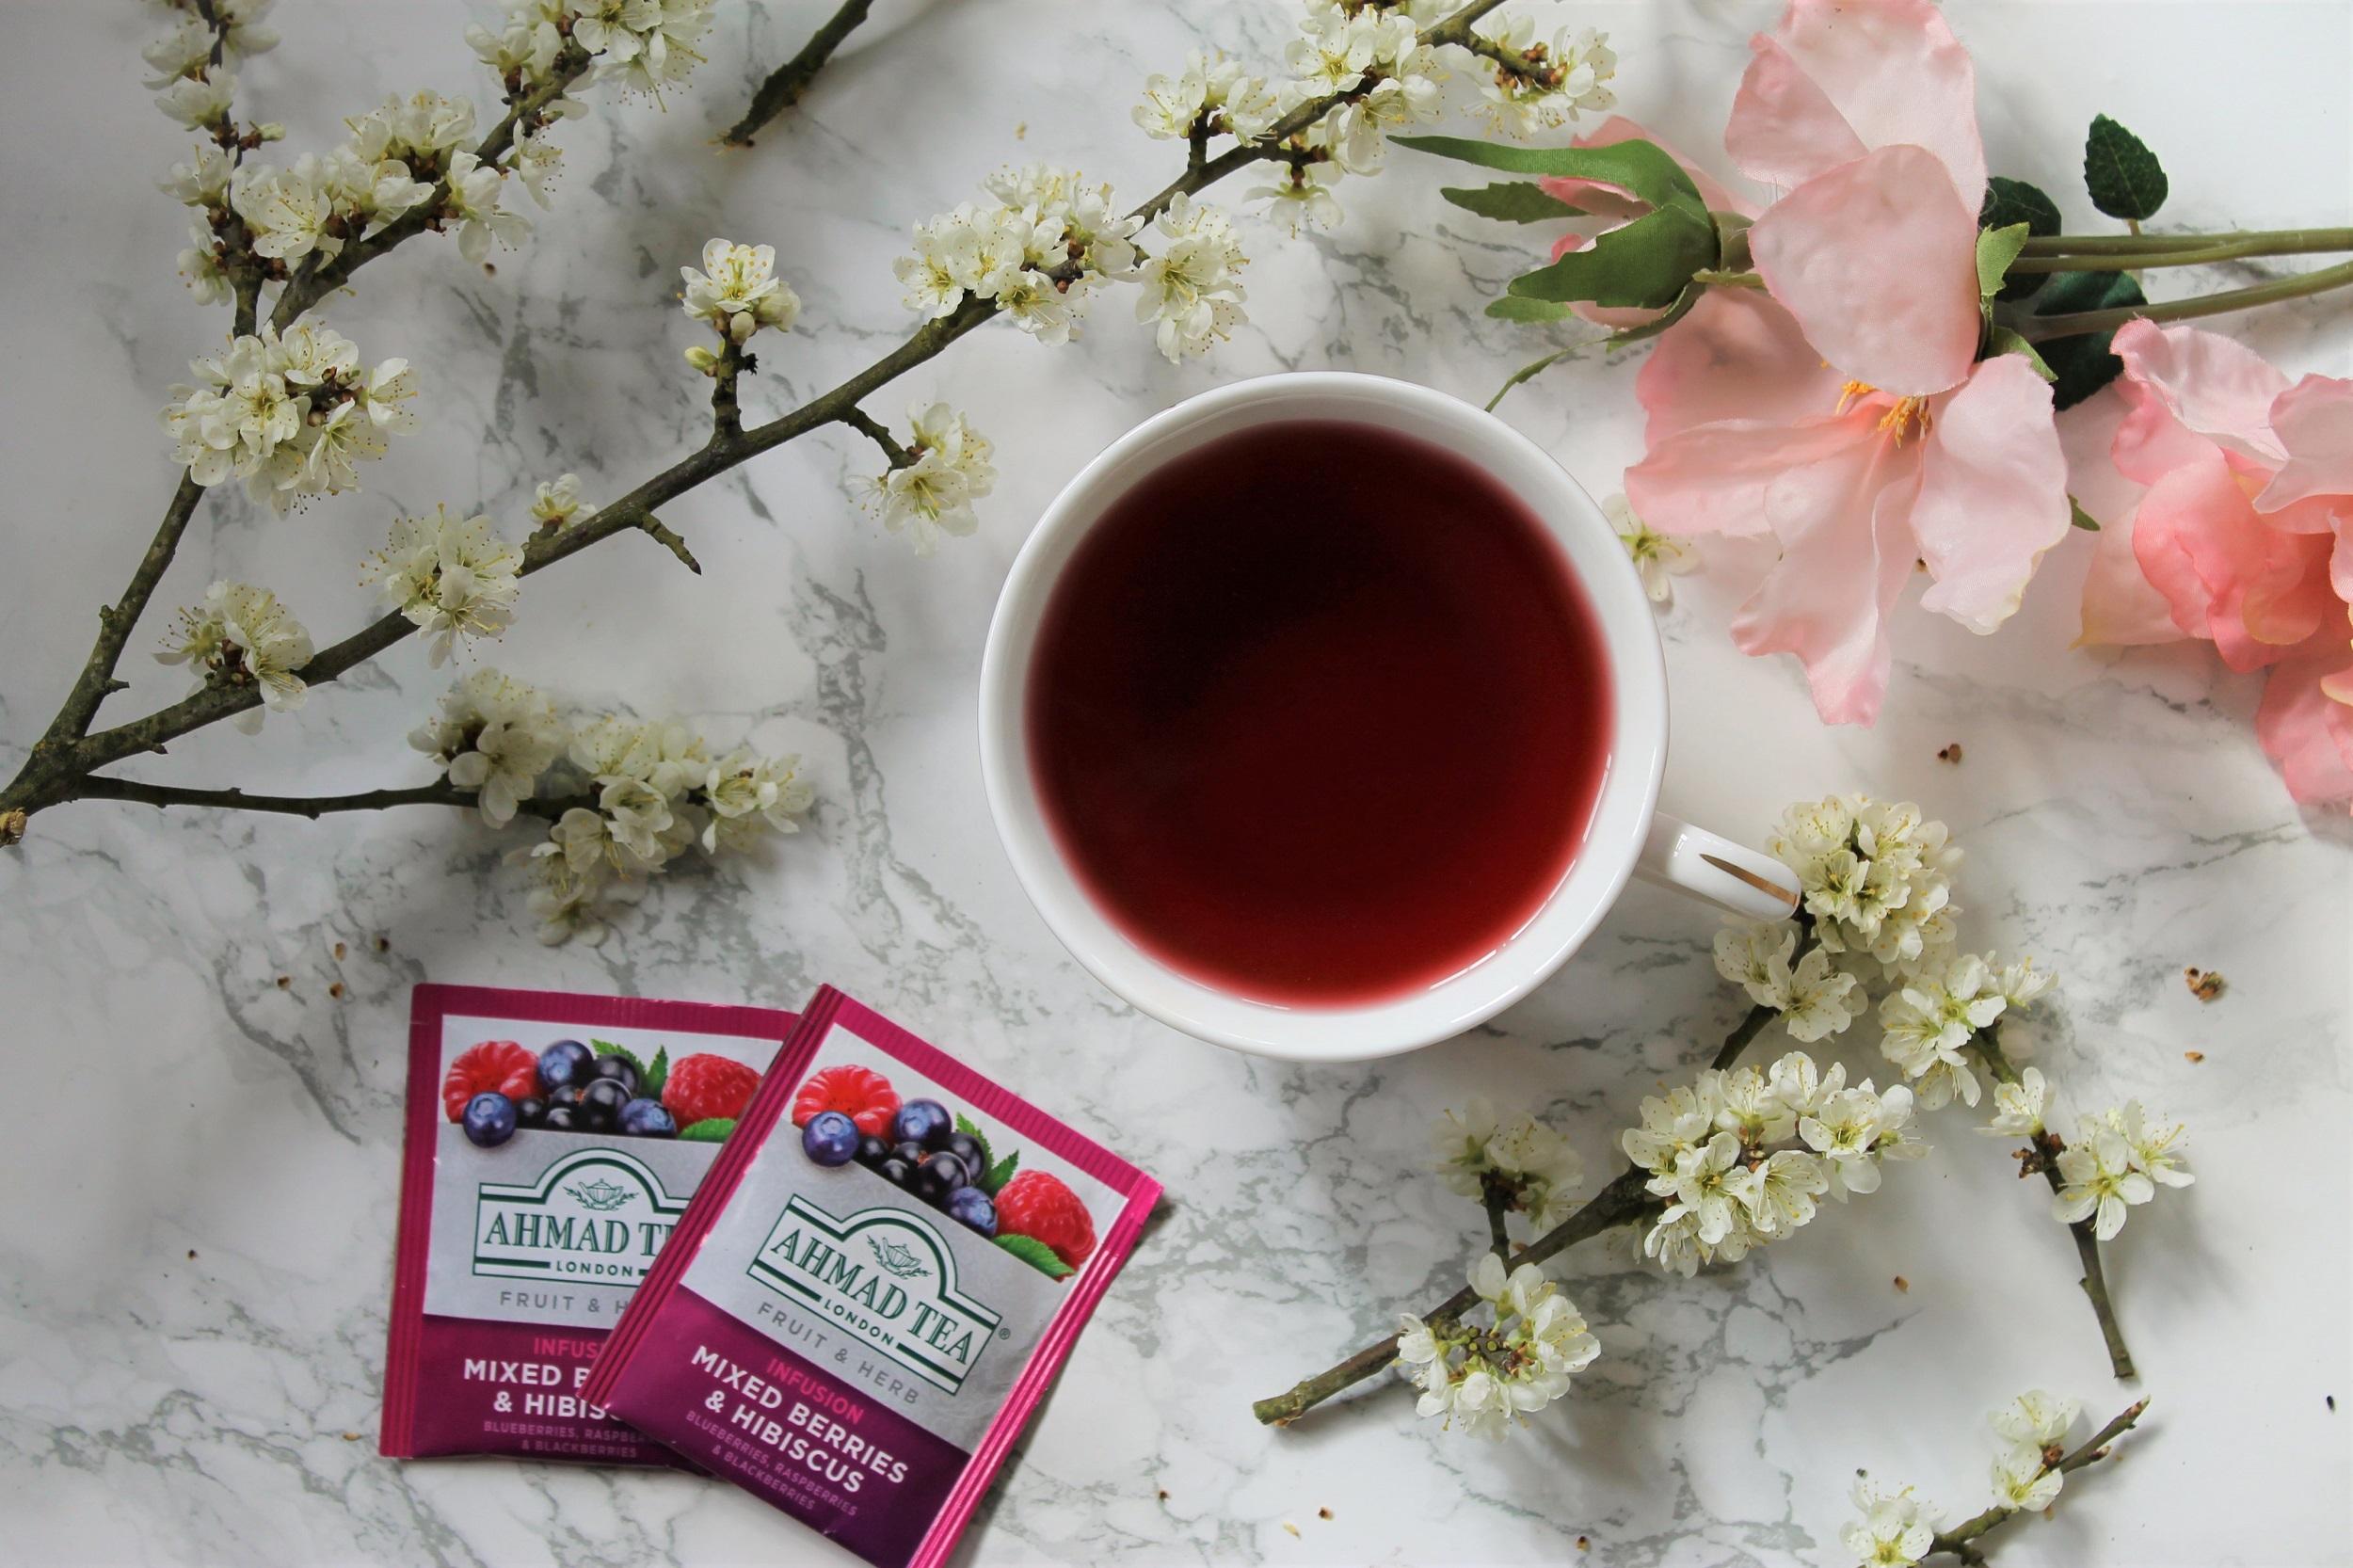 Ahmad Mixed Berries & Hibiscus Tea Review